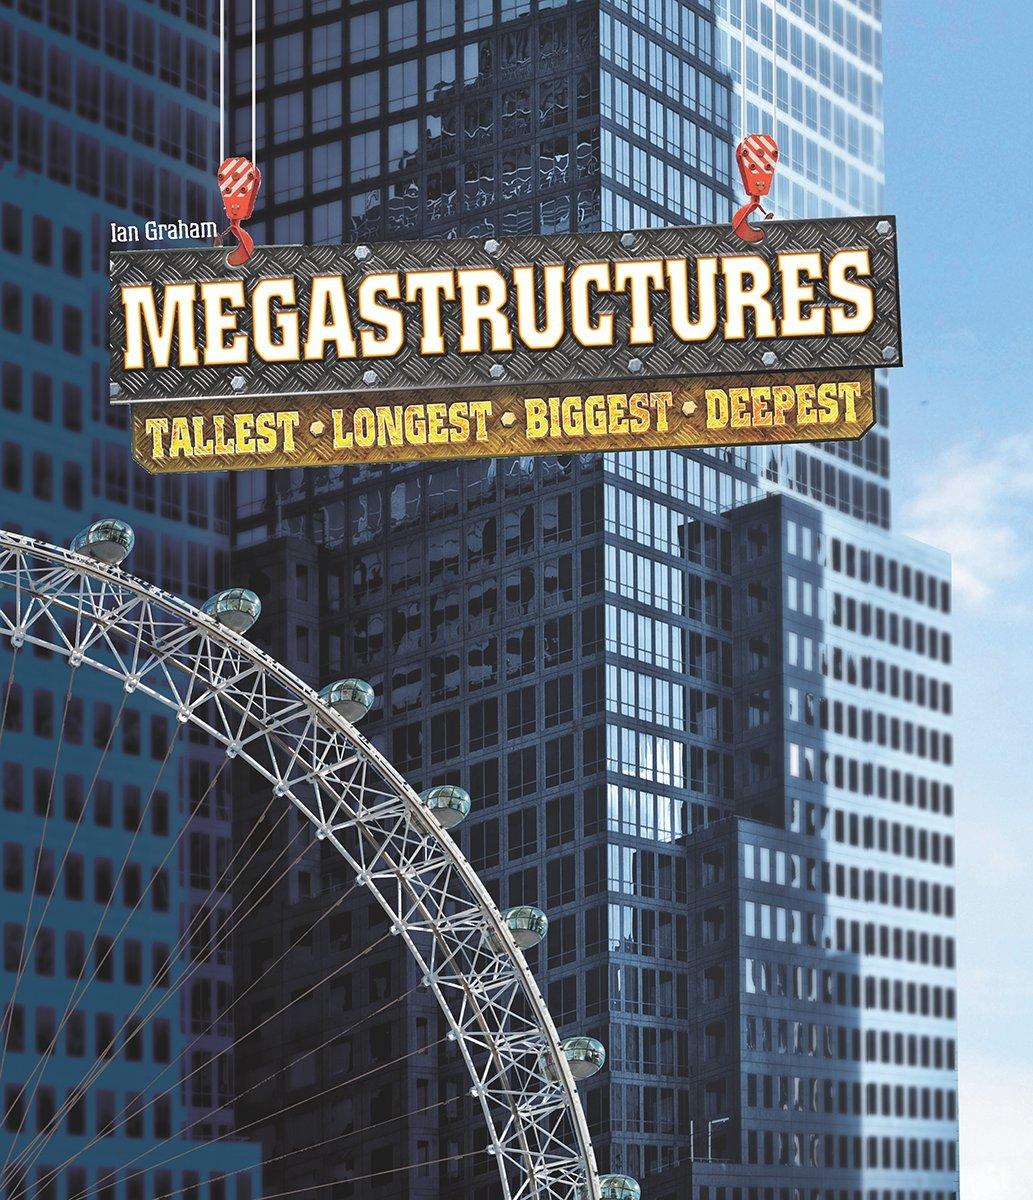 Megastructures: Tallest, Longest, Biggest, Deepest